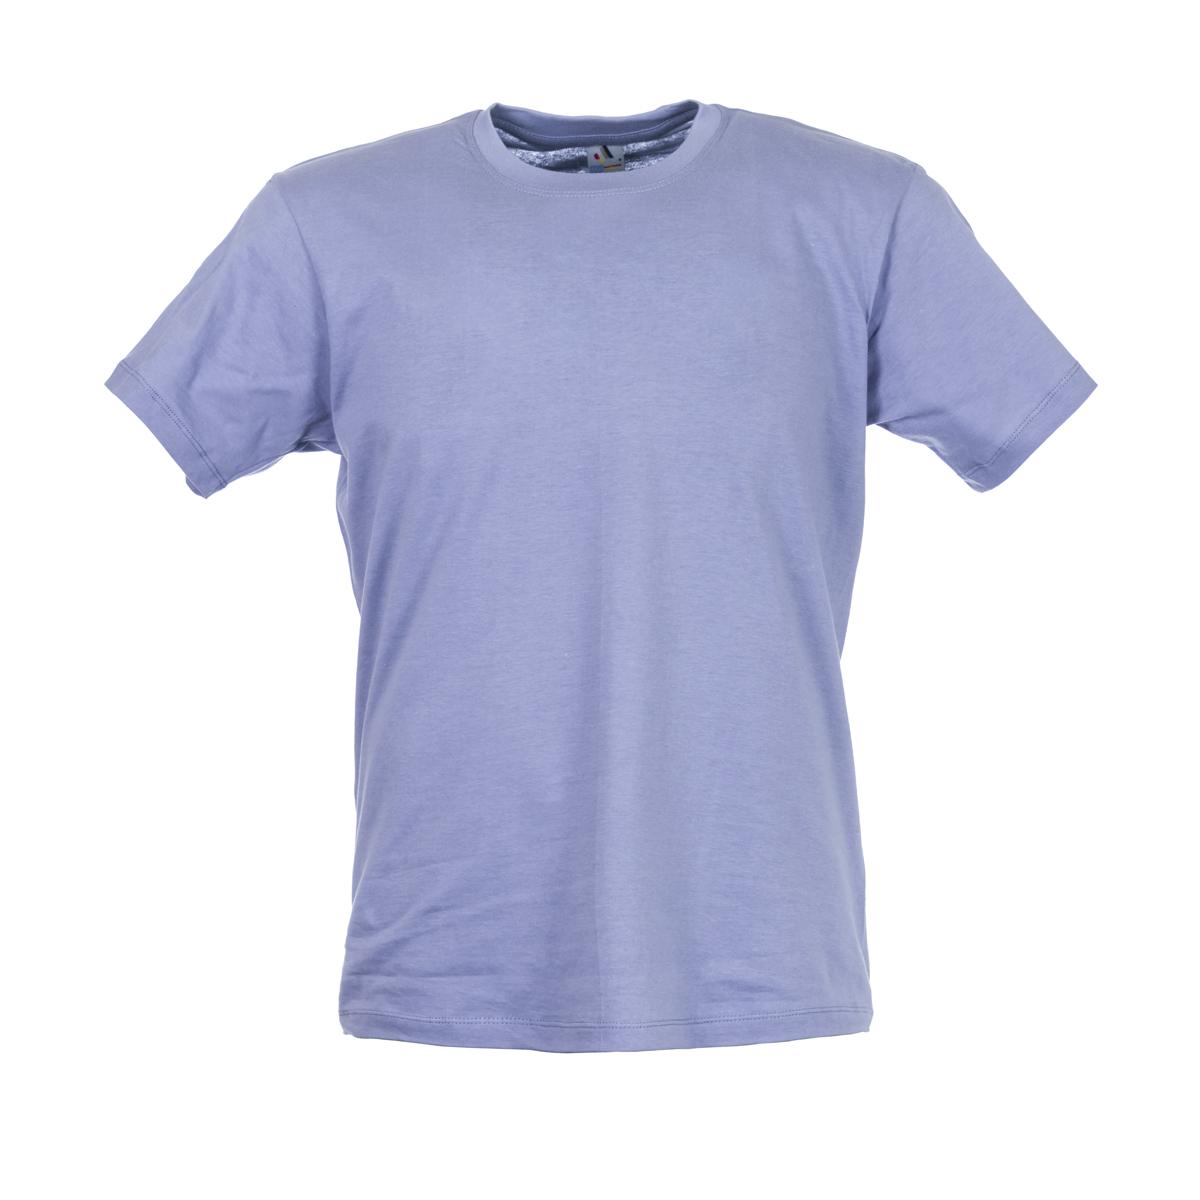 Муж. футболка арт. 04-0054 Серый р. 48Майки и футболки<br>Фактический ОГ:96 см<br>Фактический ОТ:94 см<br>Фактический ОБ:94 см<br>Длина по спинке:66 см<br>Рост:178-188 см<br><br>Тип: Муж. футболка<br>Размер: 48<br>Материал: Кулирка